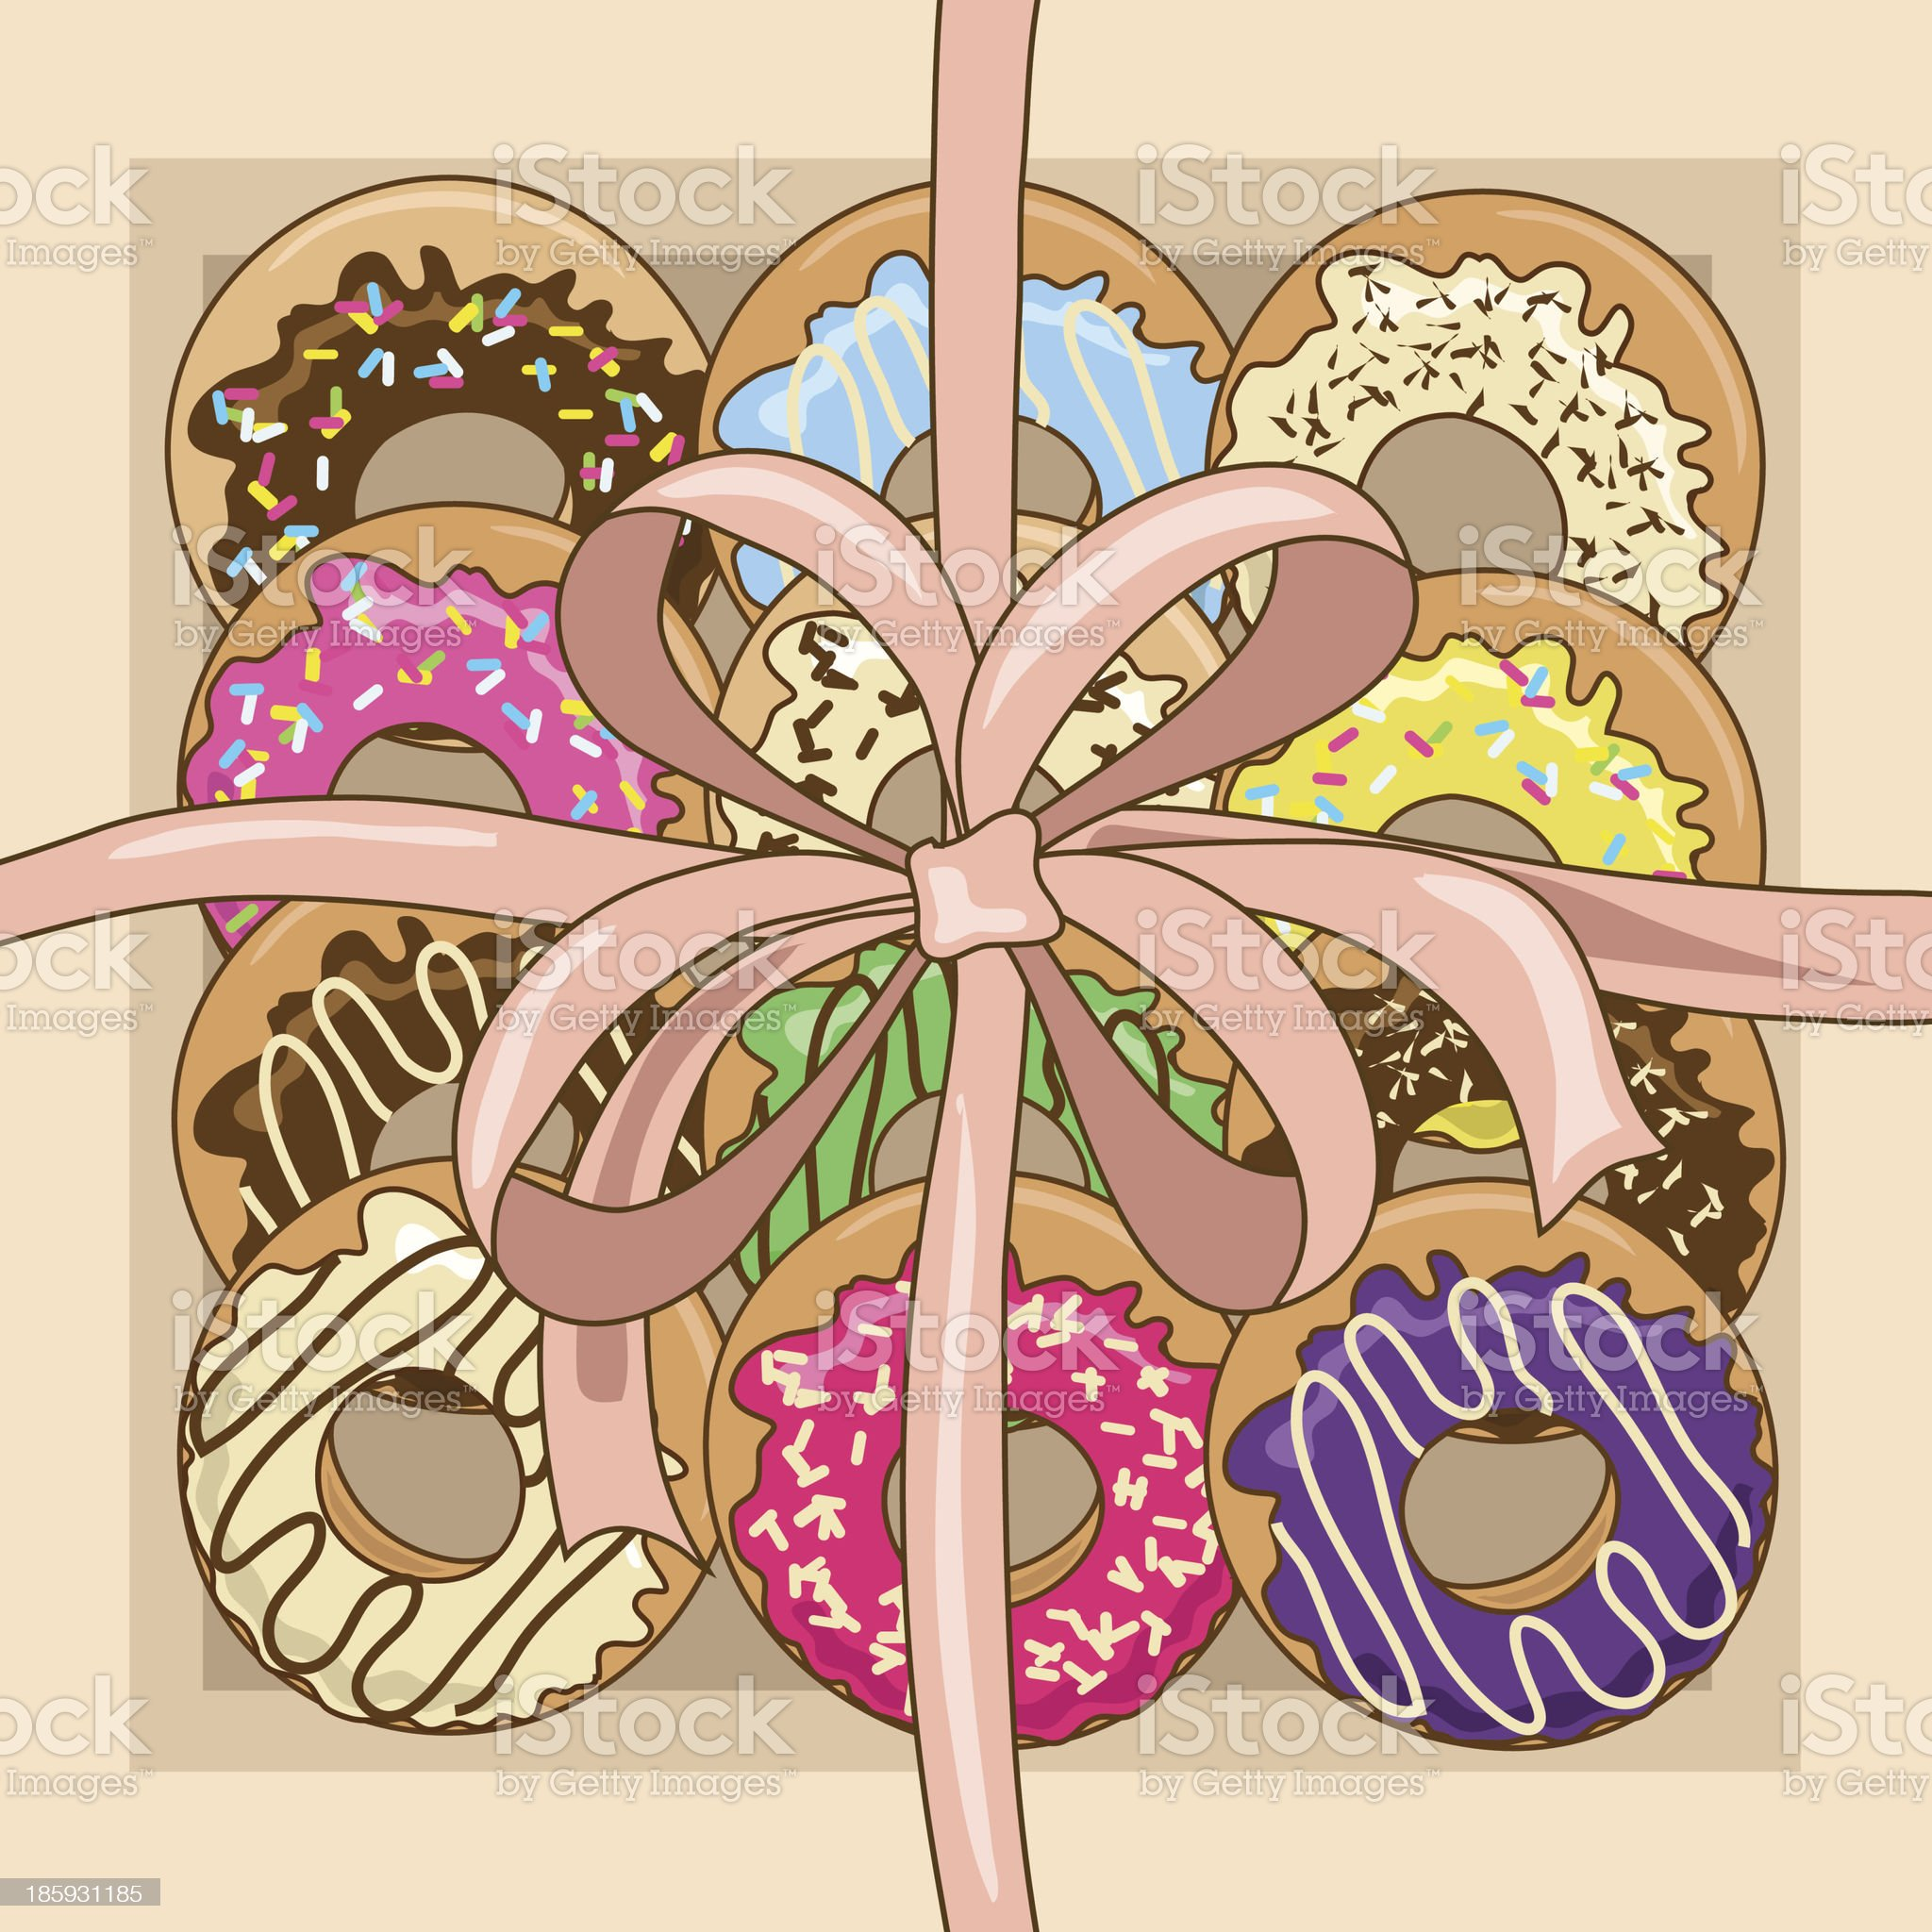 Gift box of donuts royalty-free stock vector art